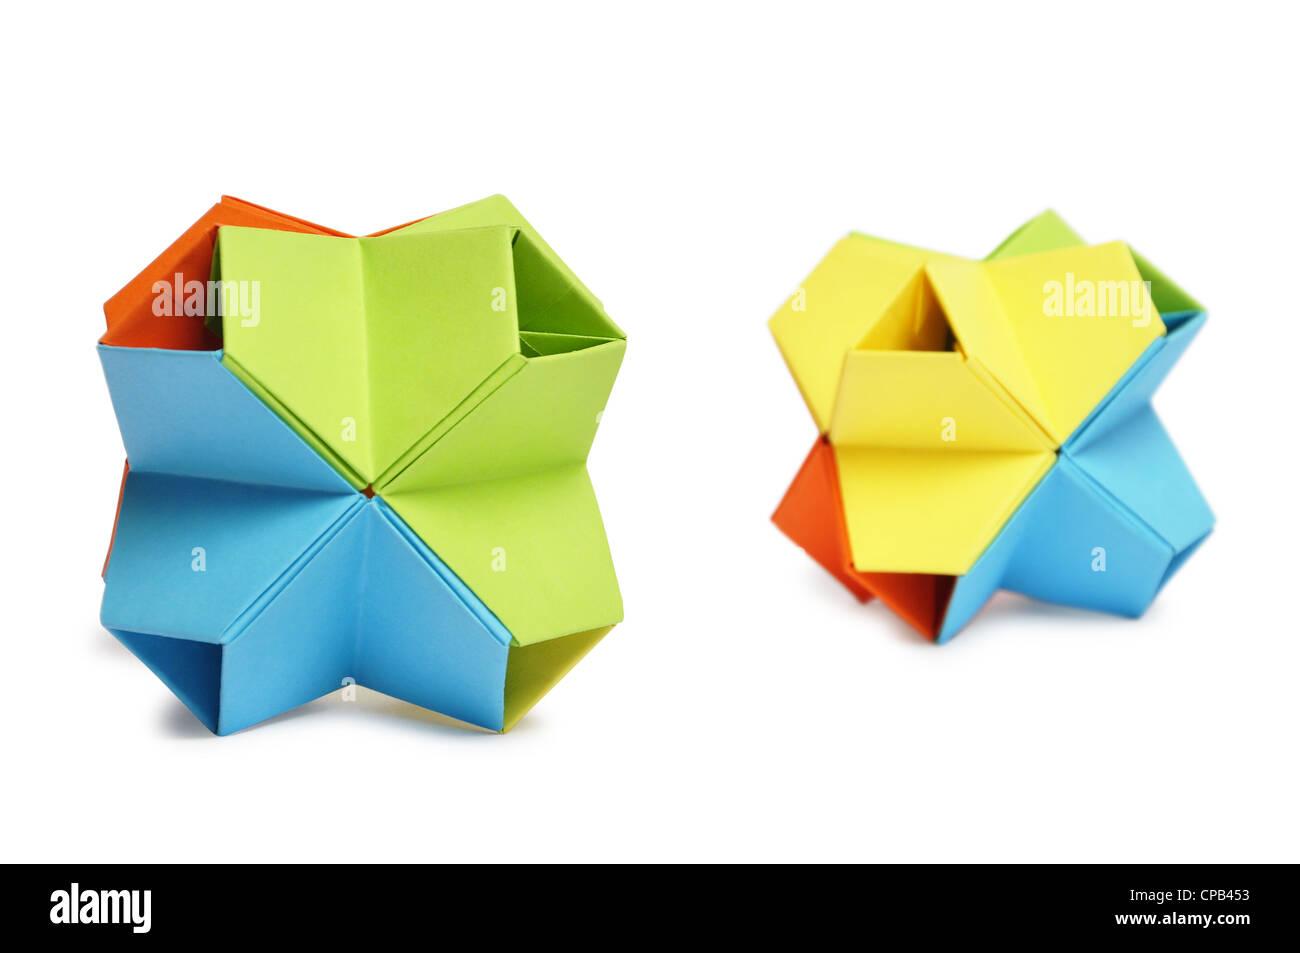 Farbenfrohe Origami Kusudama isoliert auf weiss. Stockbild